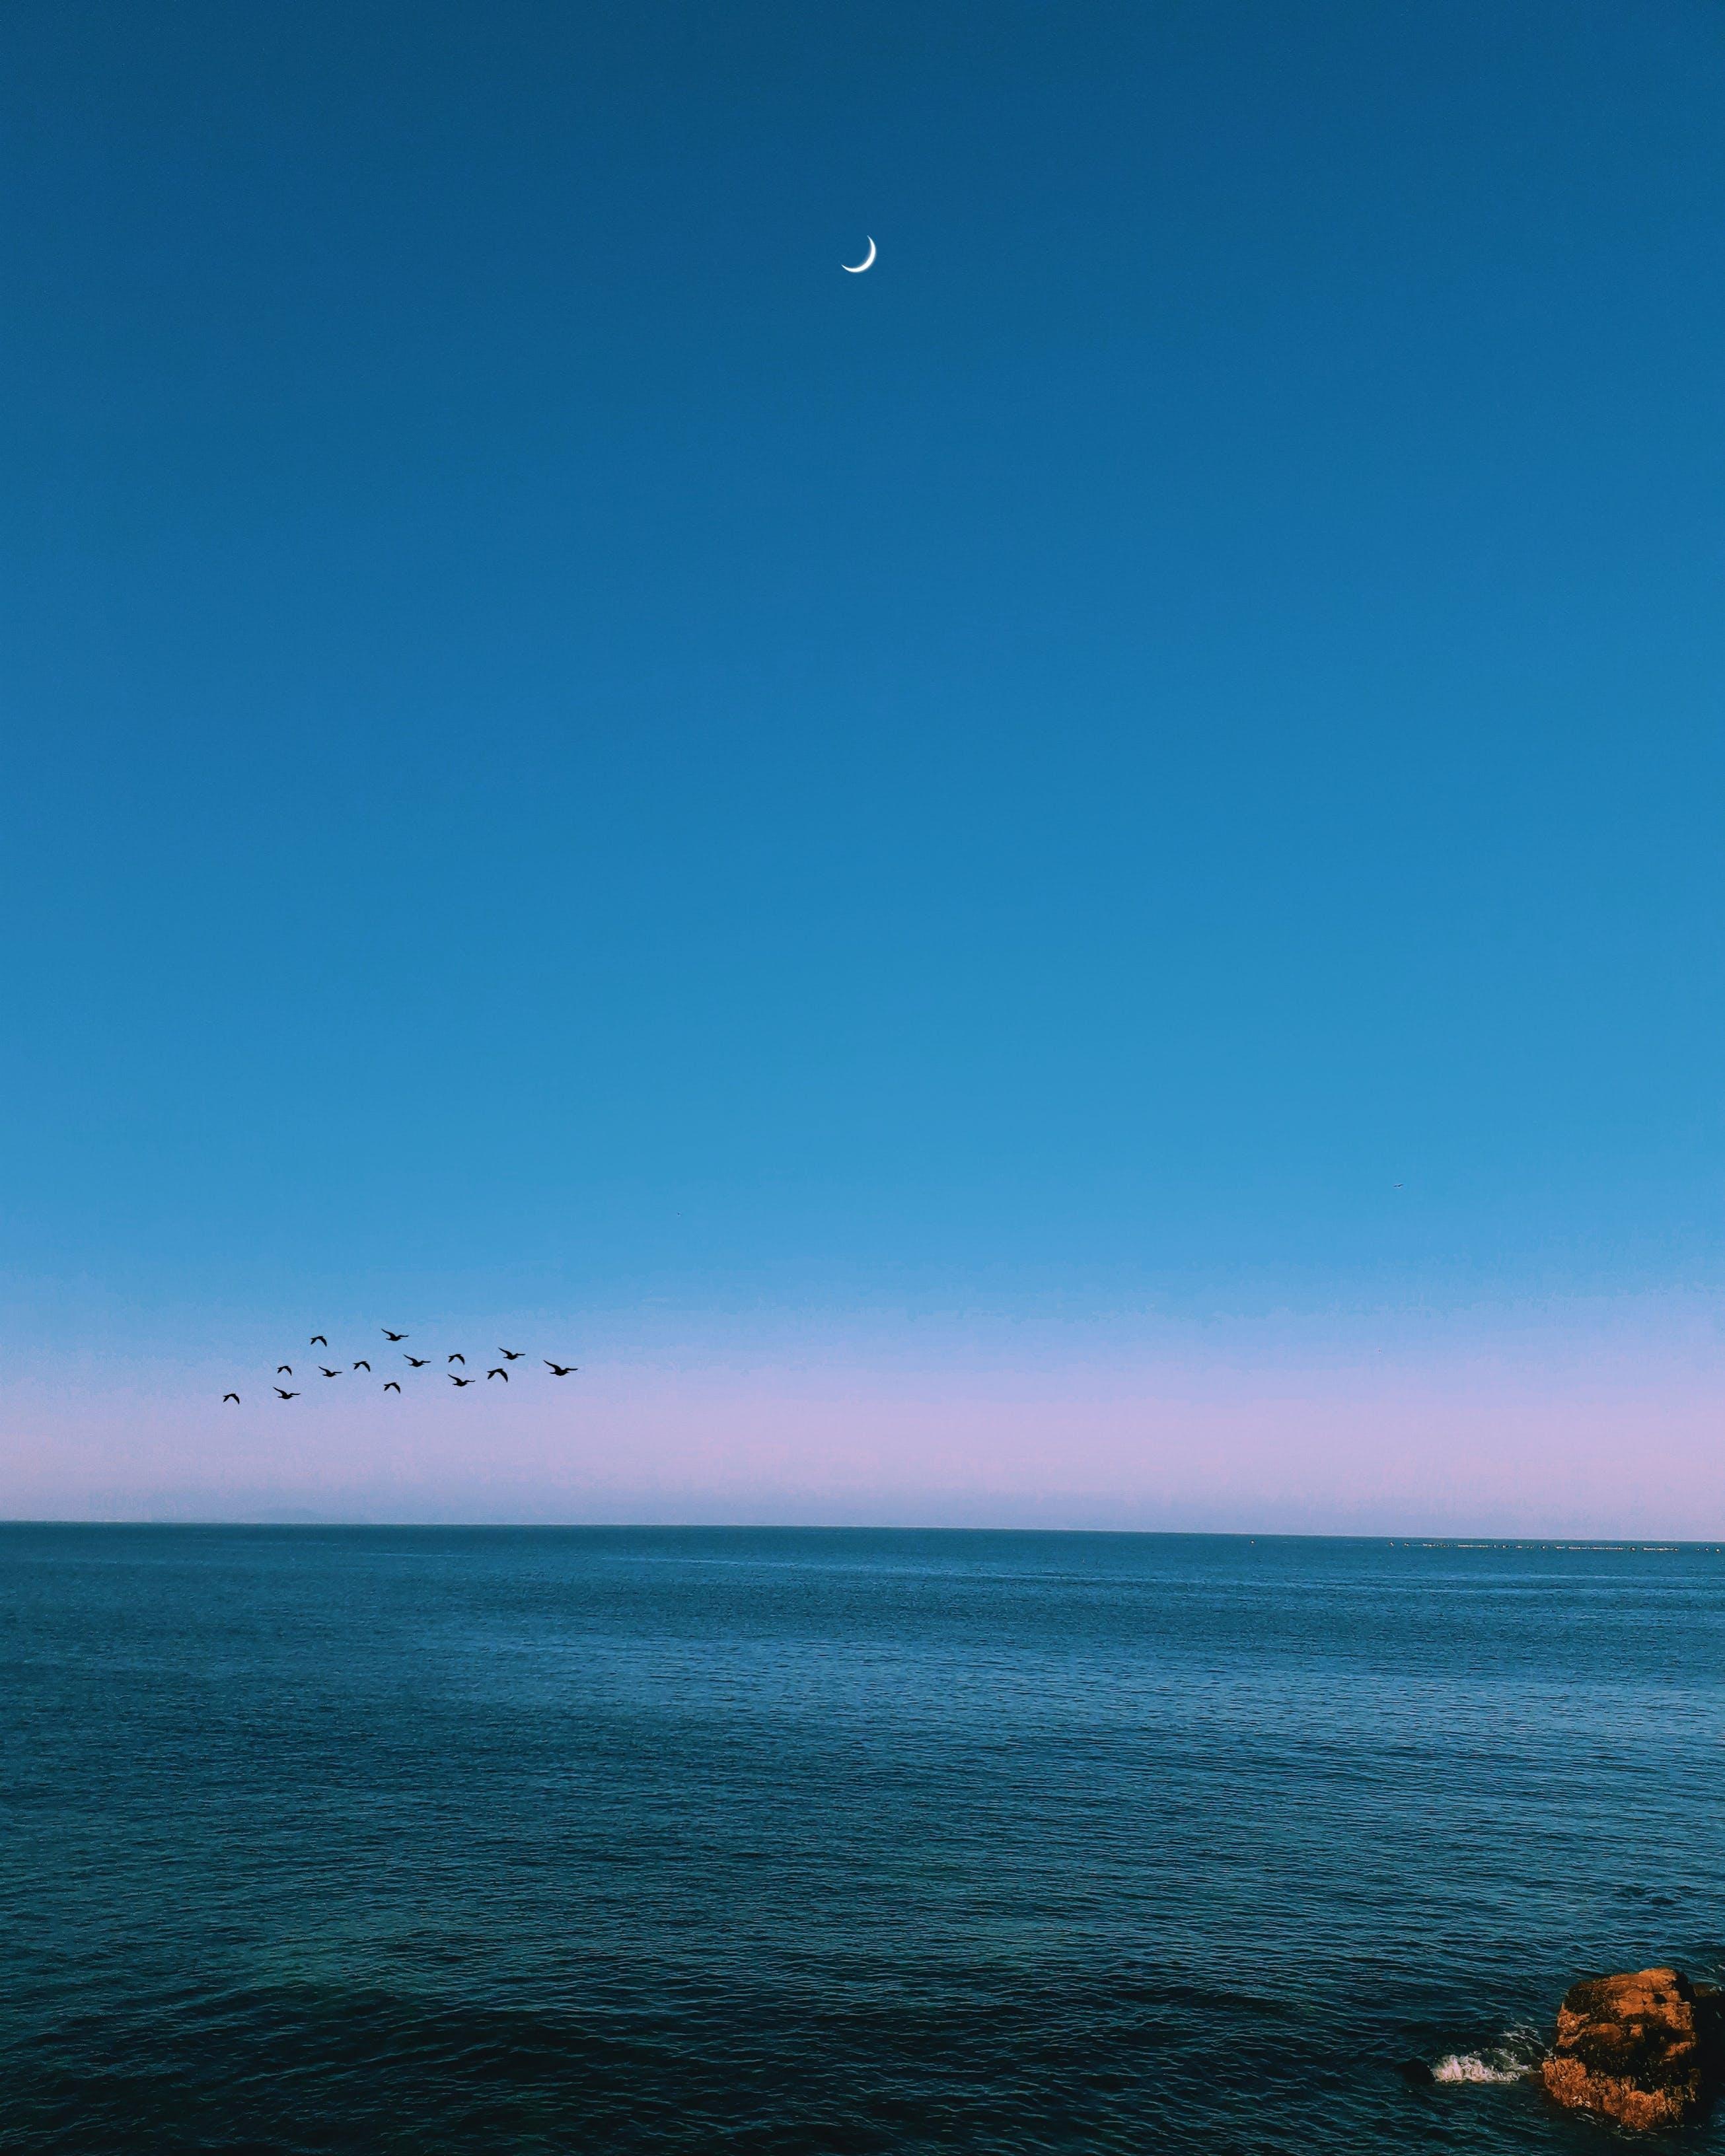 açık hava, akşam, akşam karanlığı, ay içeren Ücretsiz stok fotoğraf